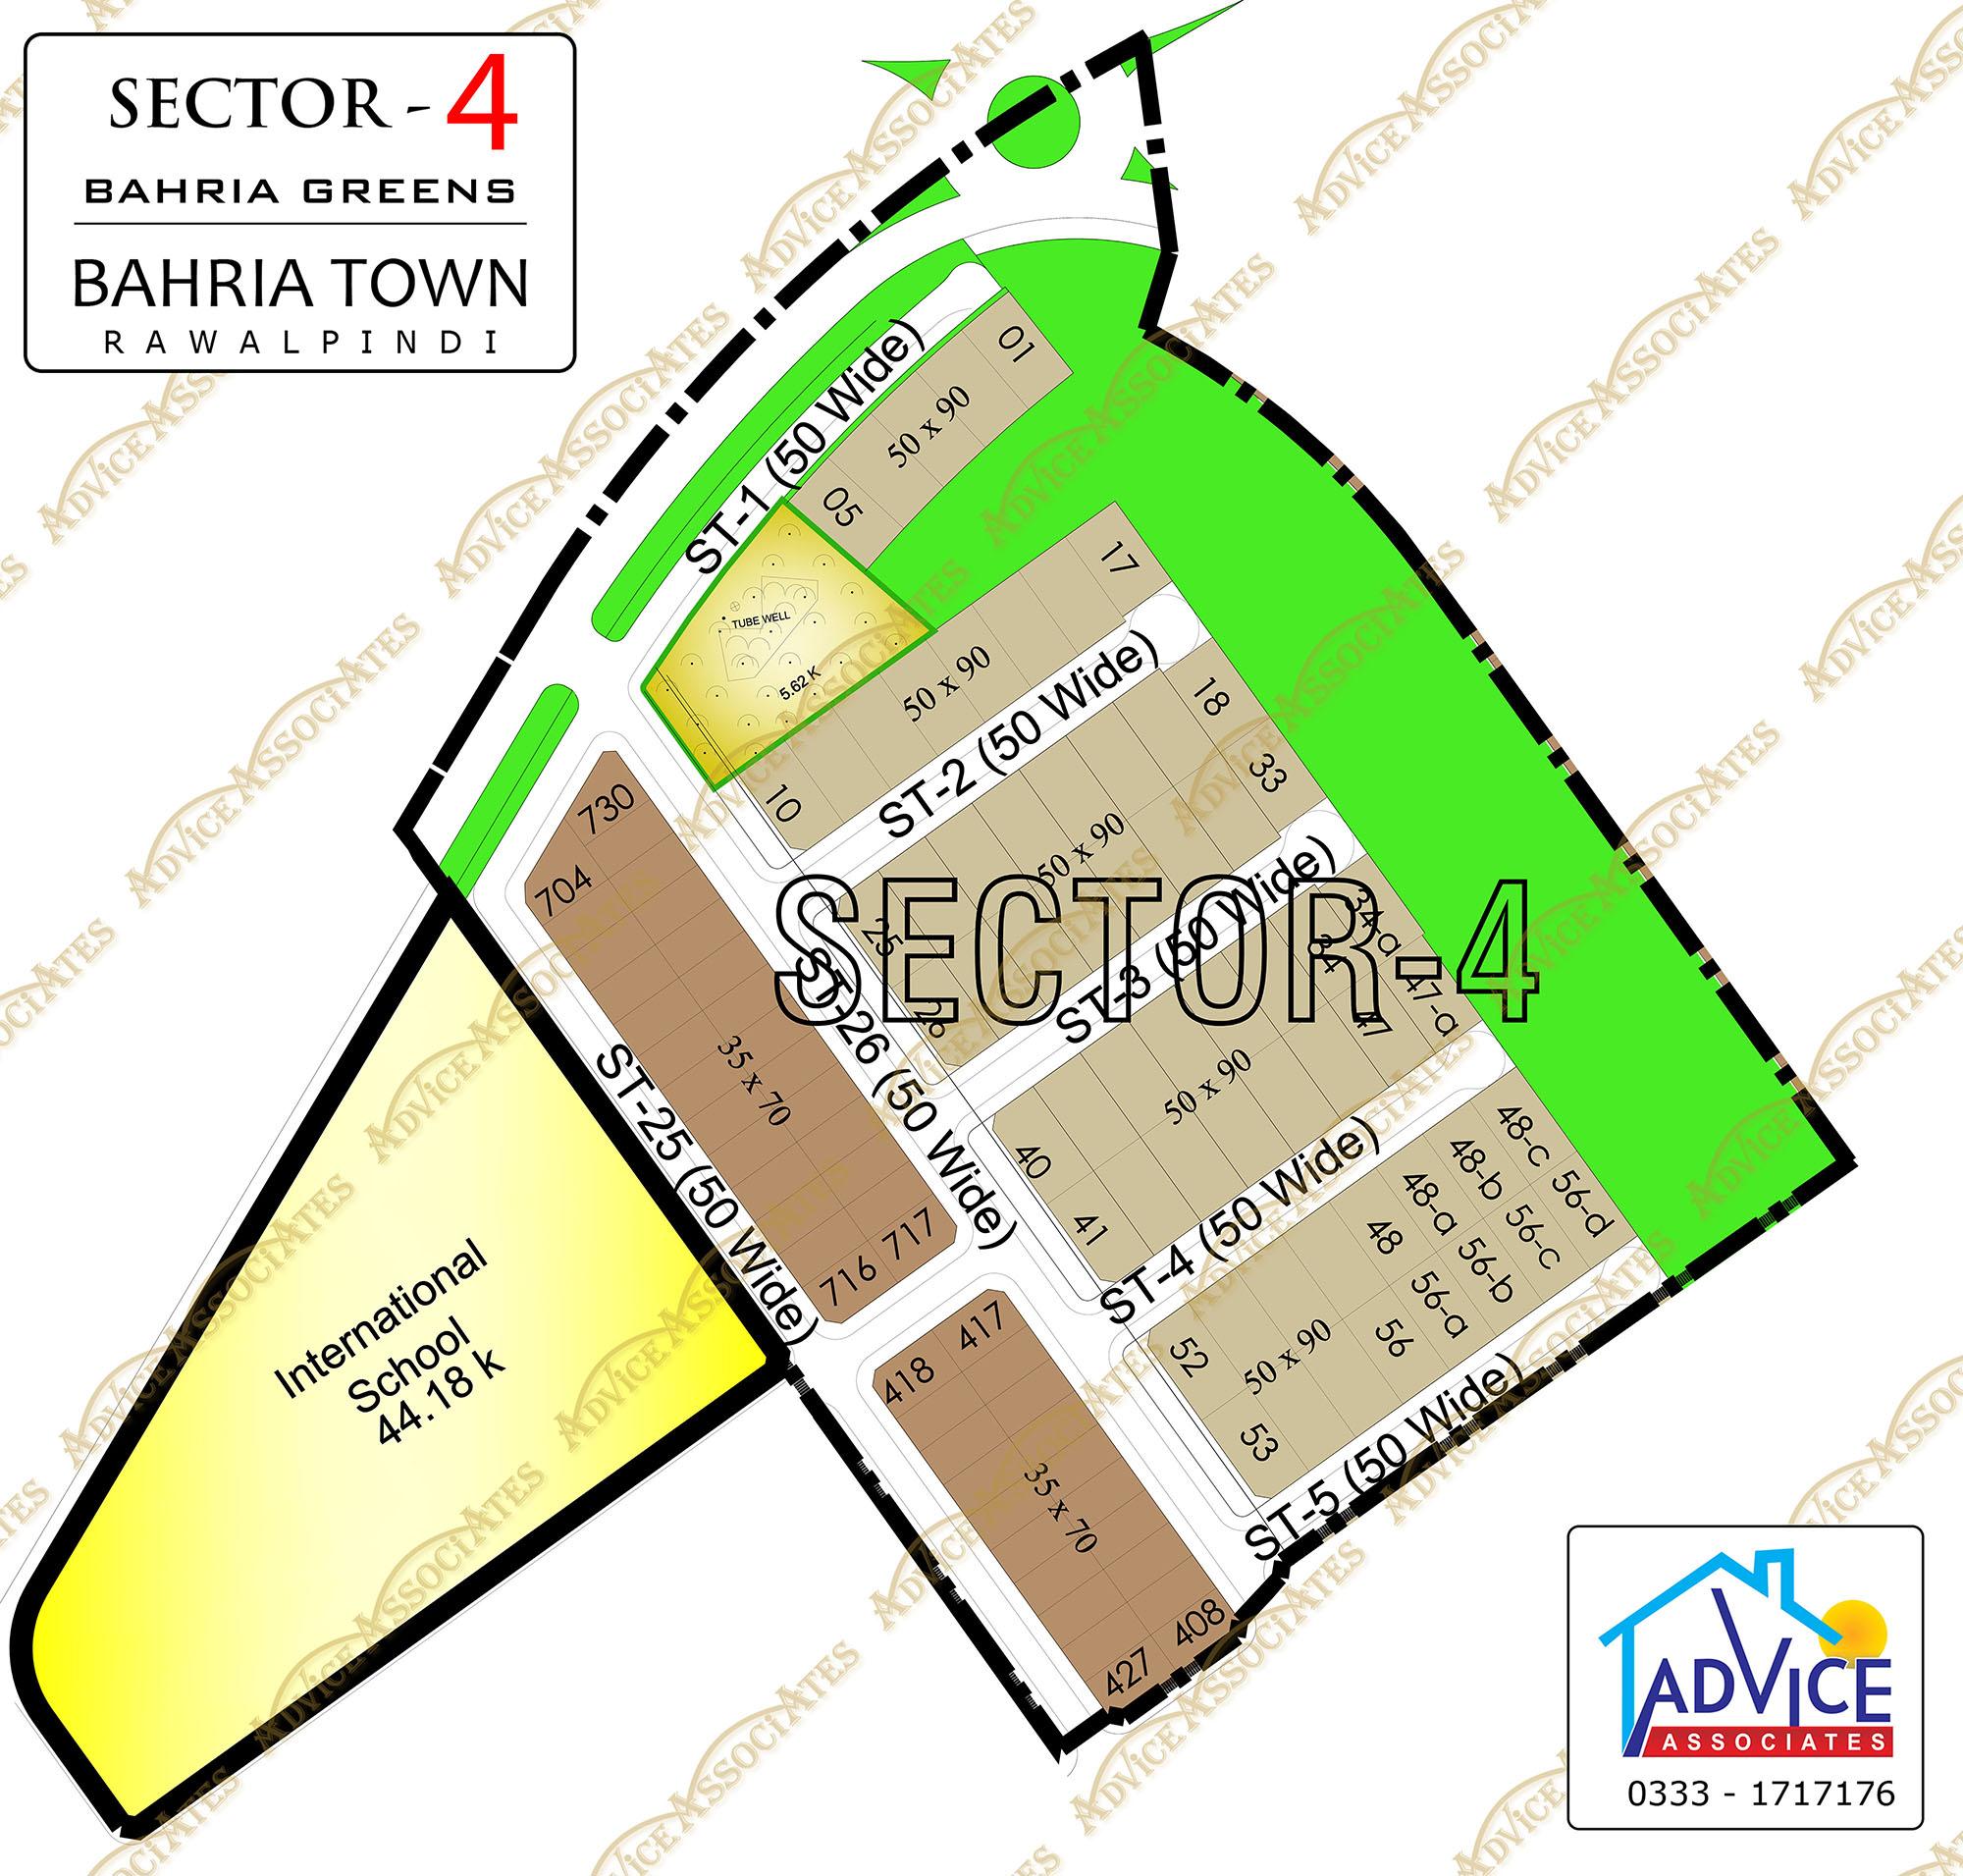 Bahria Greens Sector 4